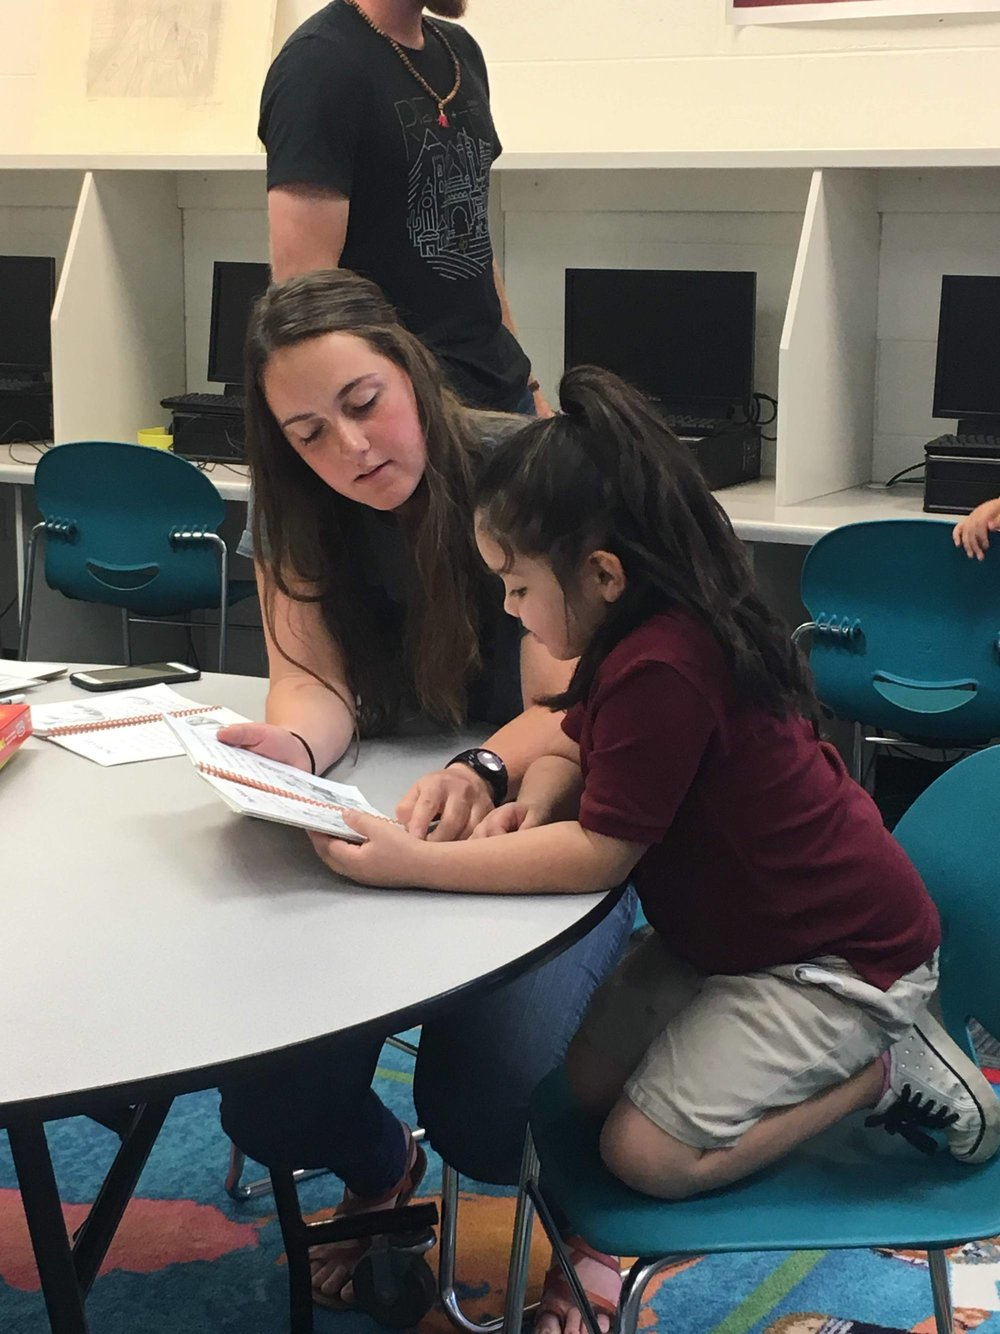 Karlee helping one of the kindergartners at the elementary school.